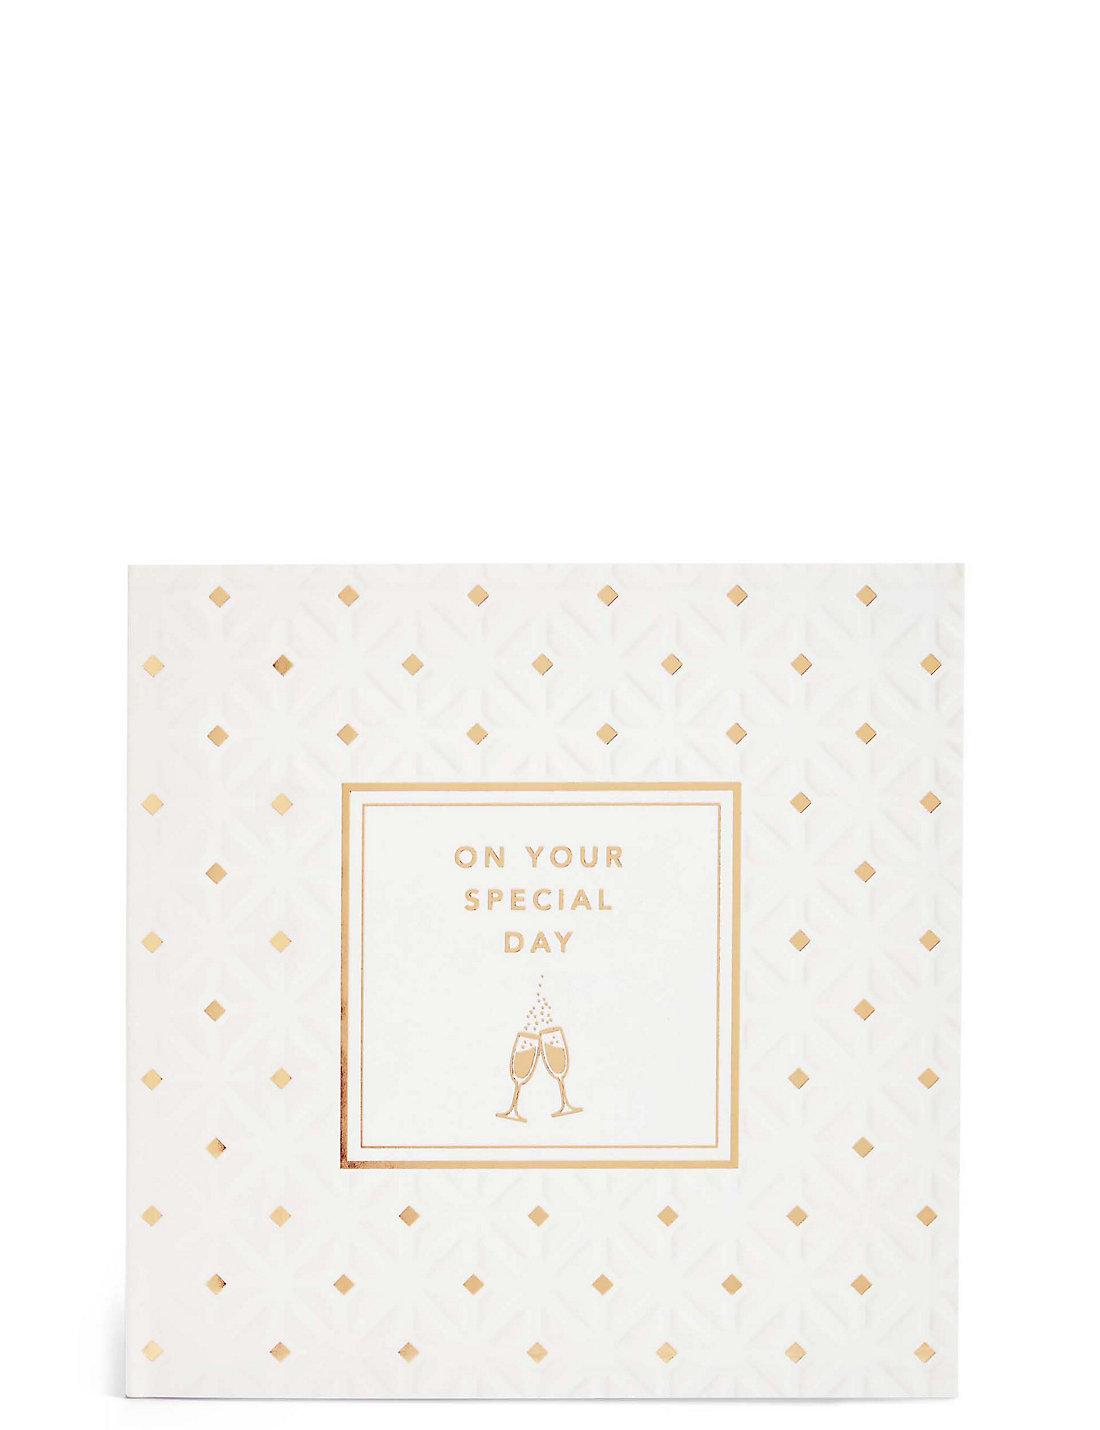 wedding gift card m u0026s